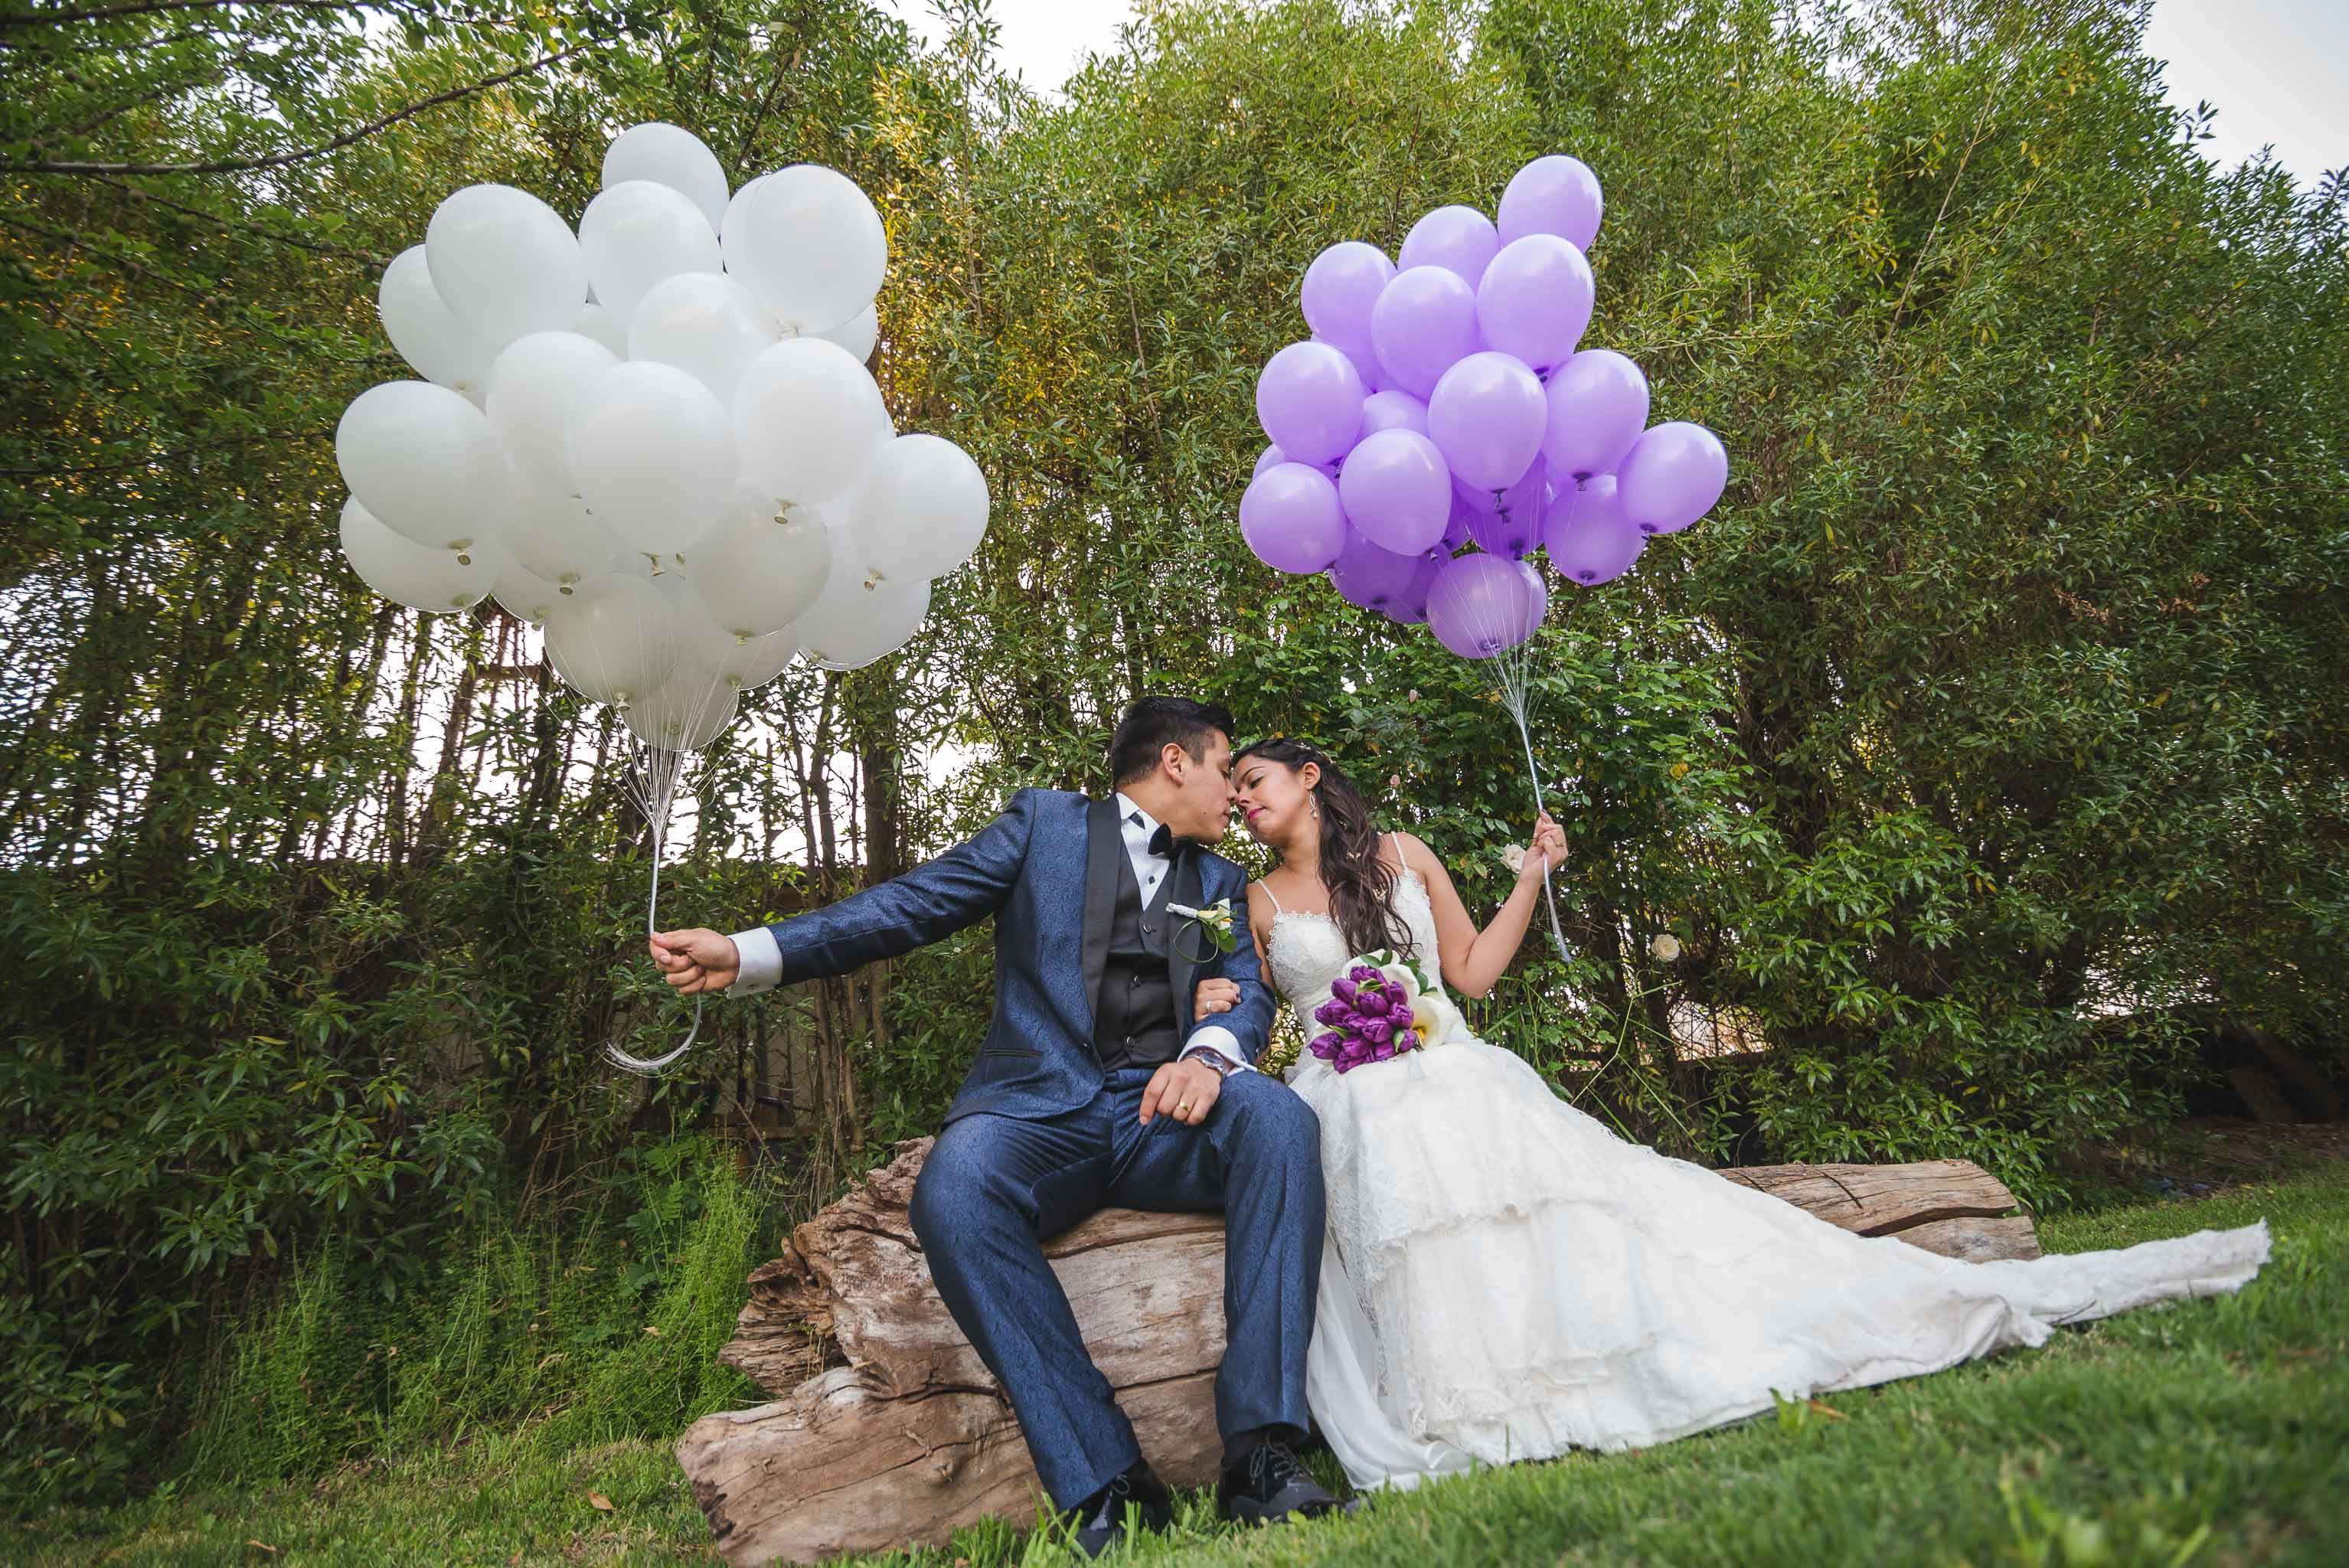 Matrimonio-centro de eventos-oliveto-santiago-fotógrafo de matrimonios-sesion novios